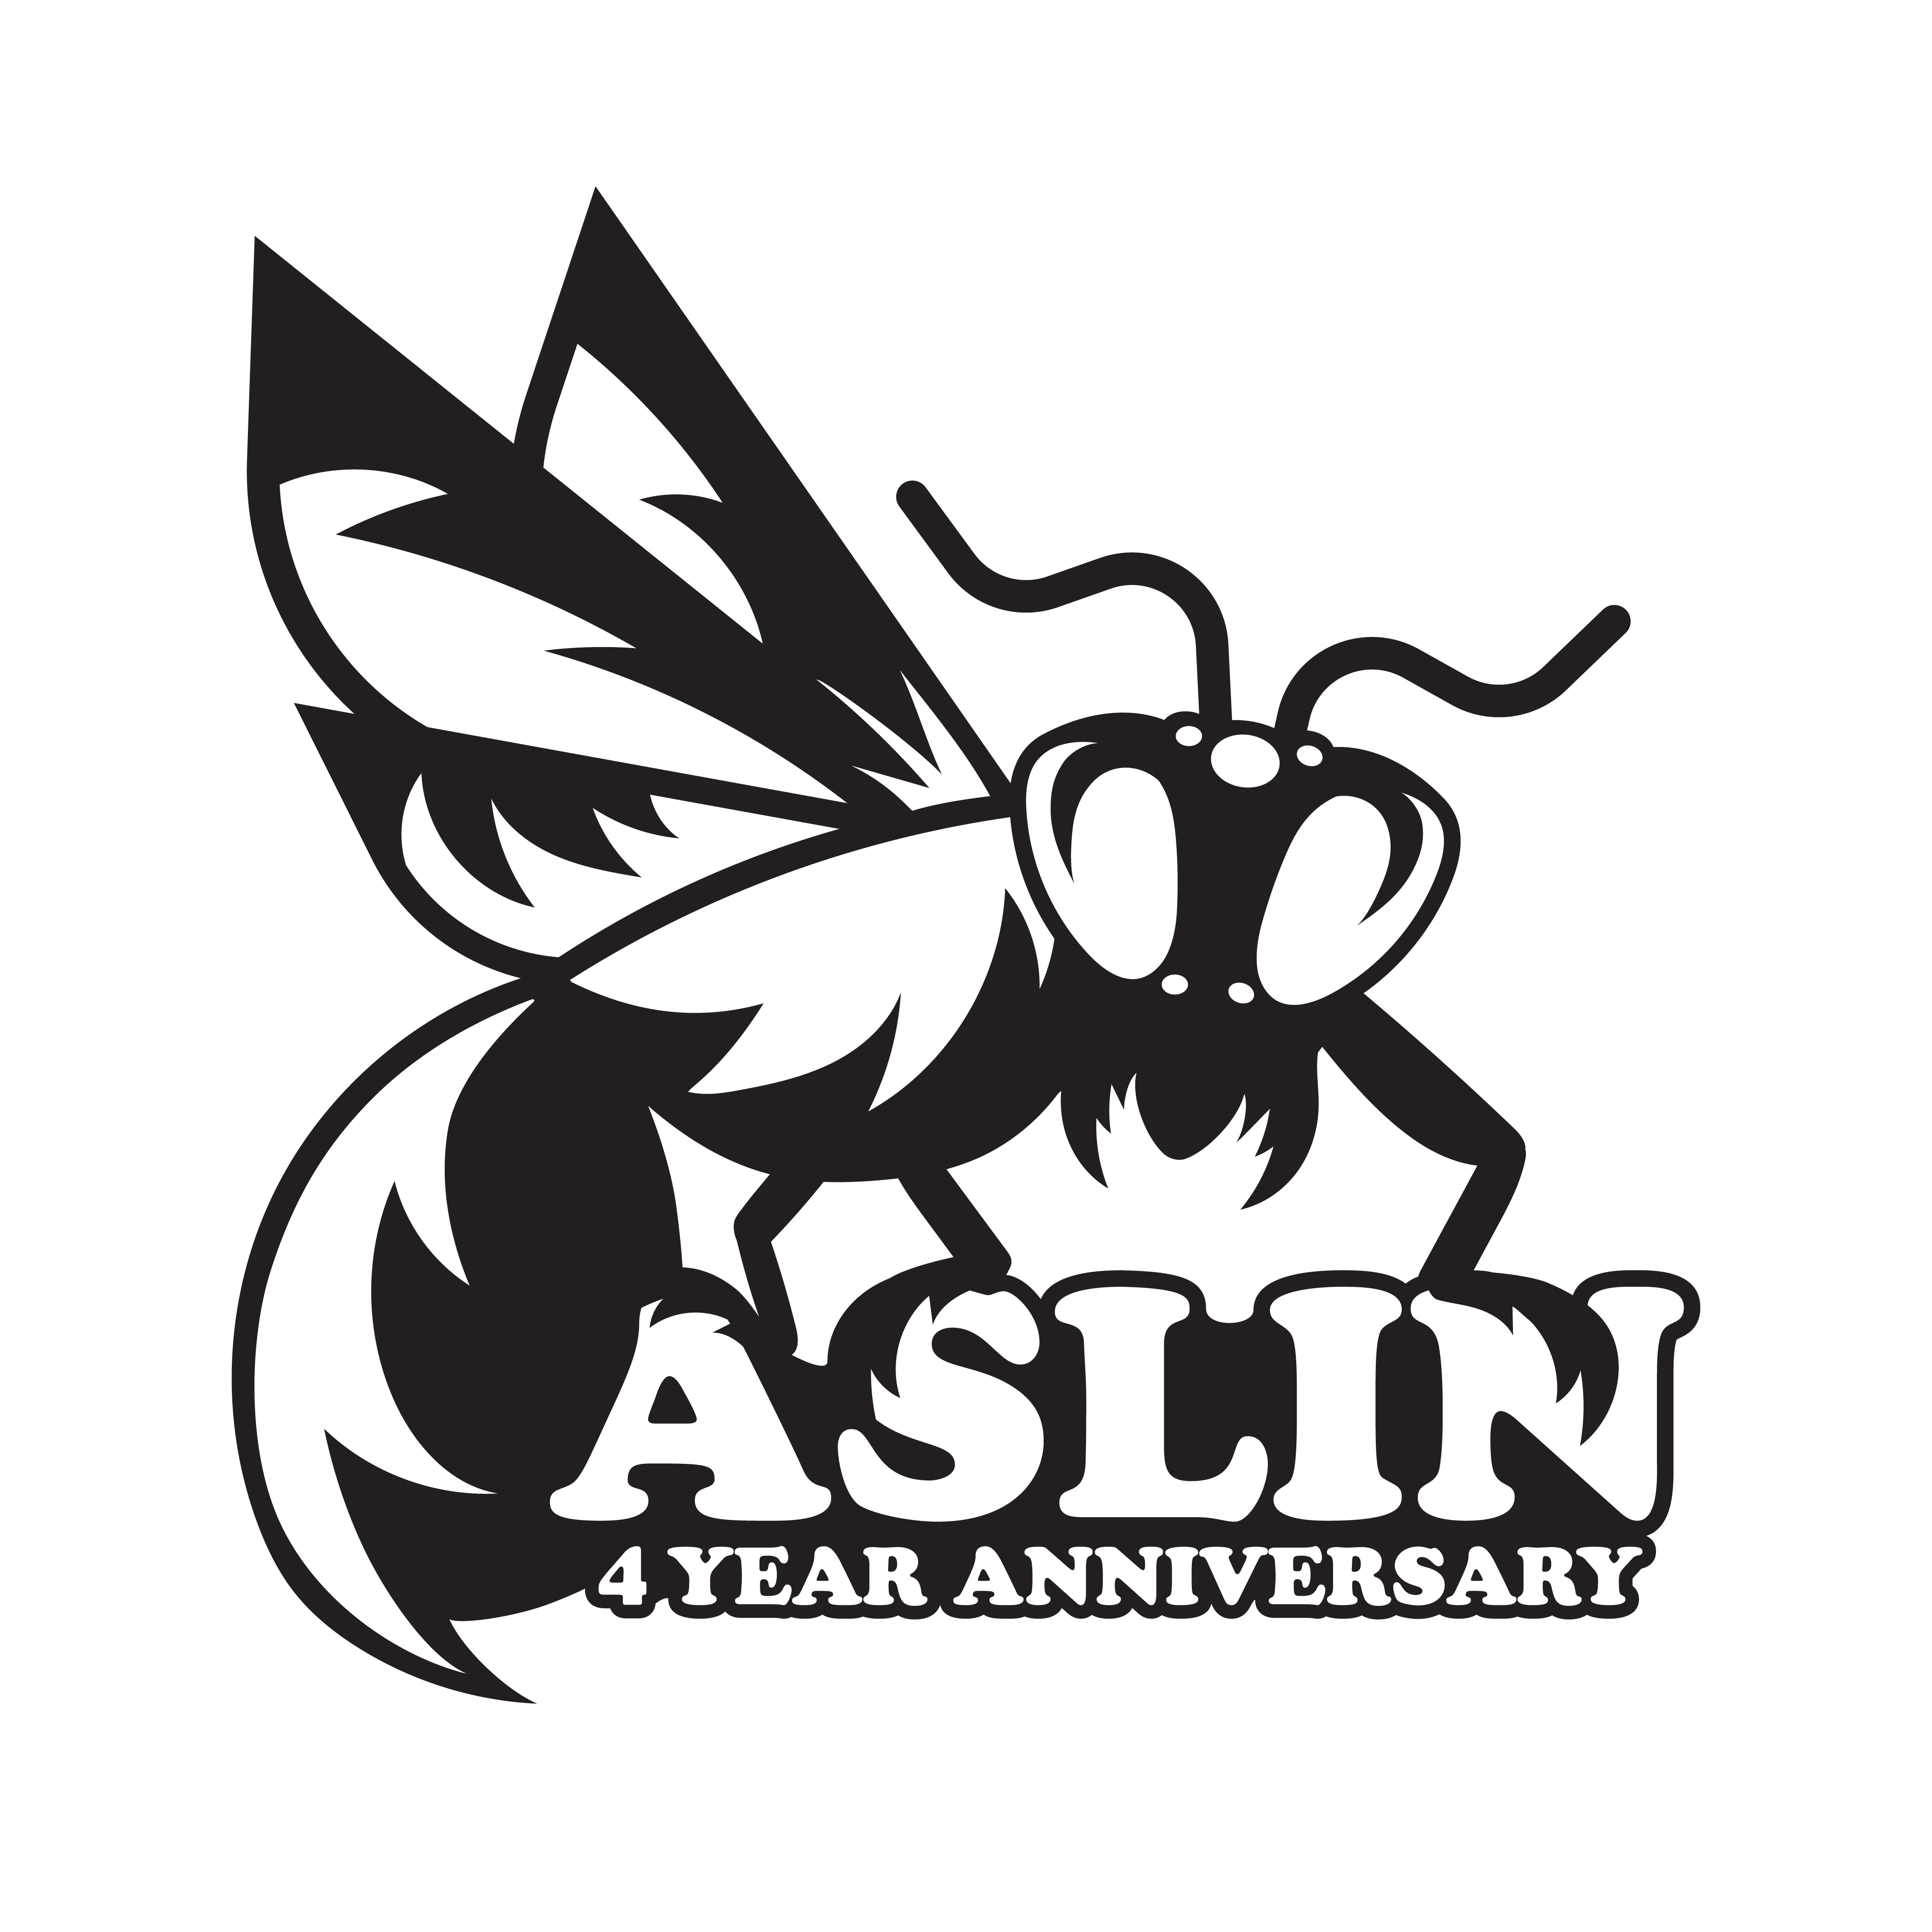 Full_Logo_Black_White_4th_Anniversary_As